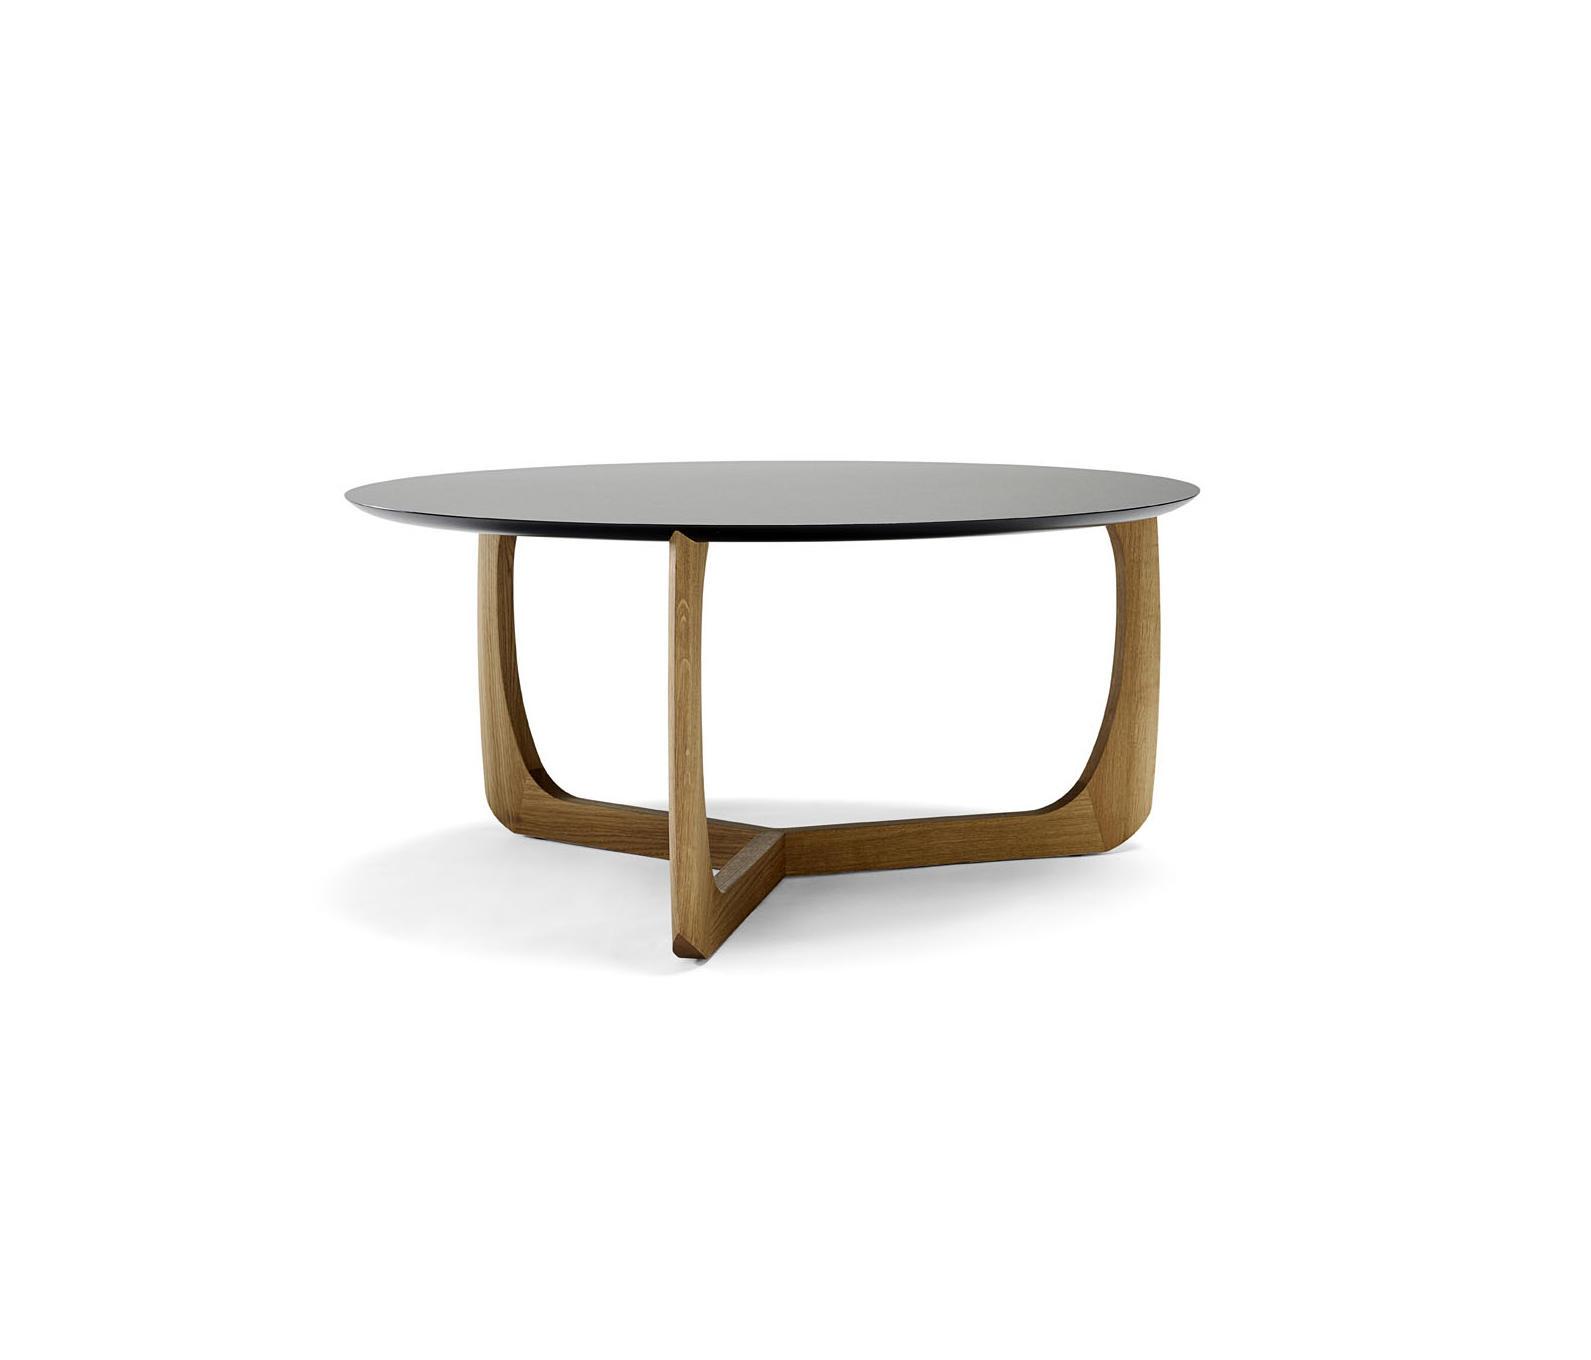 lili lounge tables from m bel copenhagen architonic. Black Bedroom Furniture Sets. Home Design Ideas